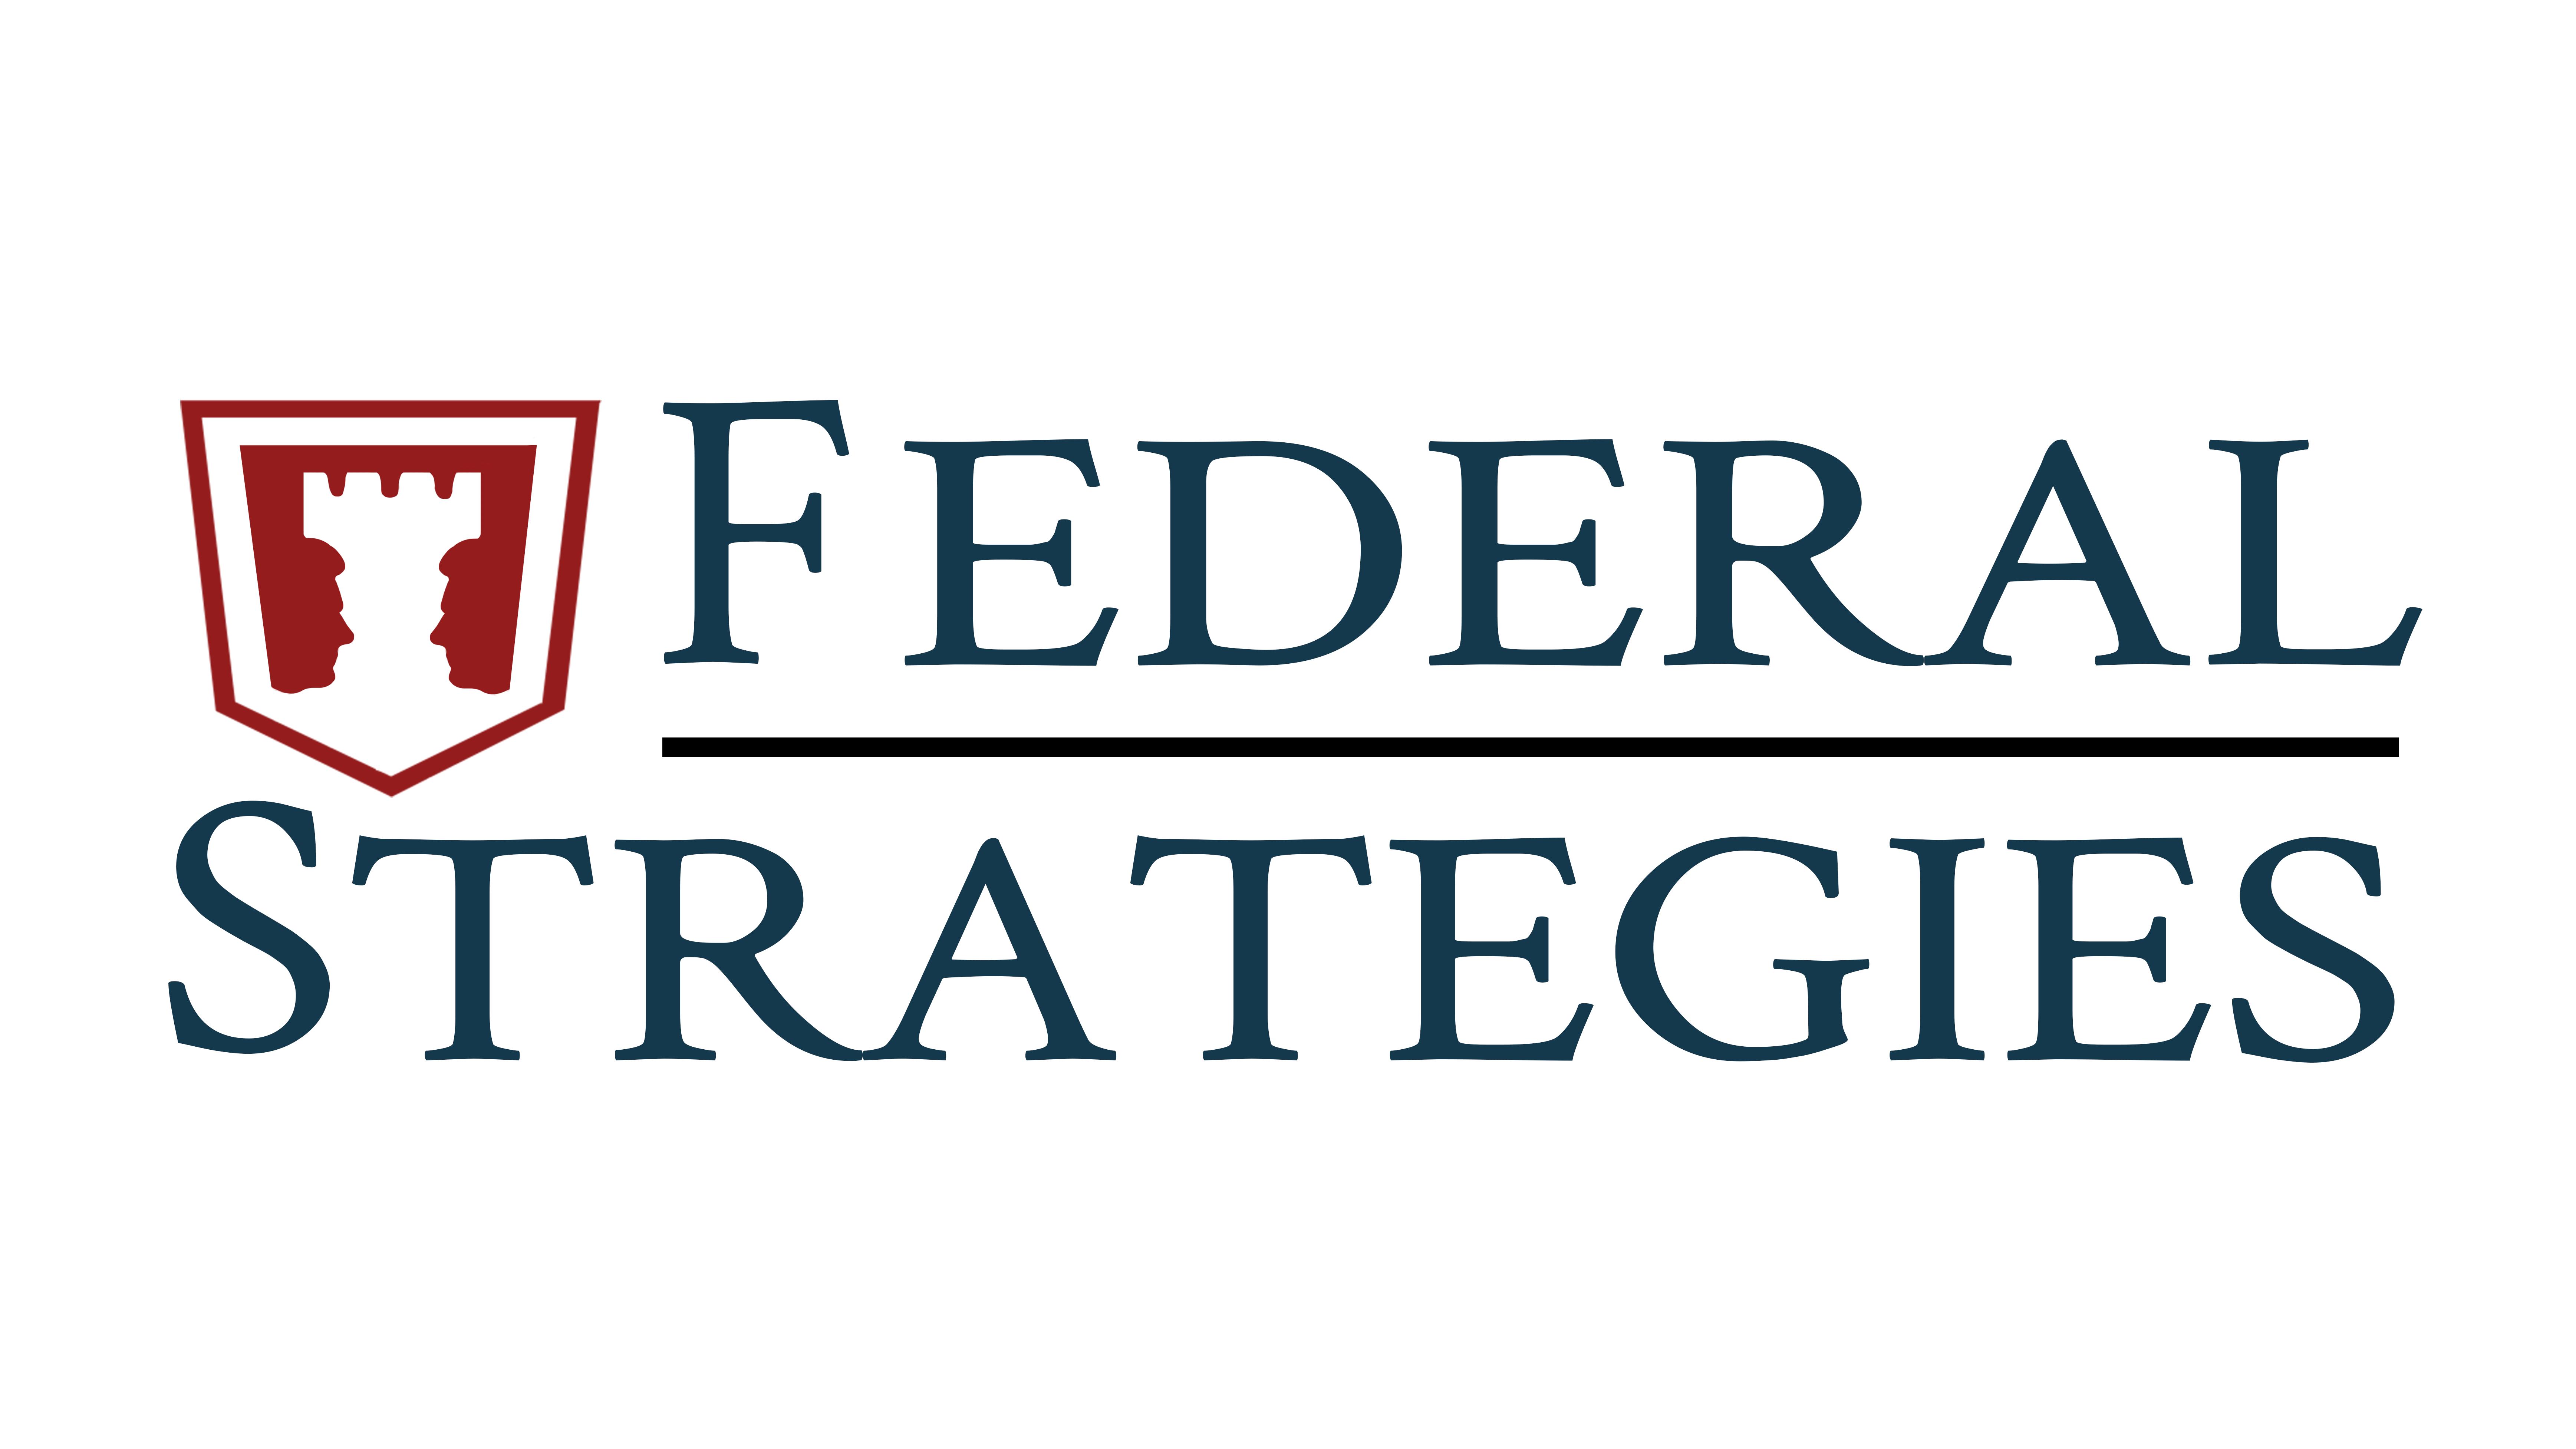 Federal-Strategists-LOGO